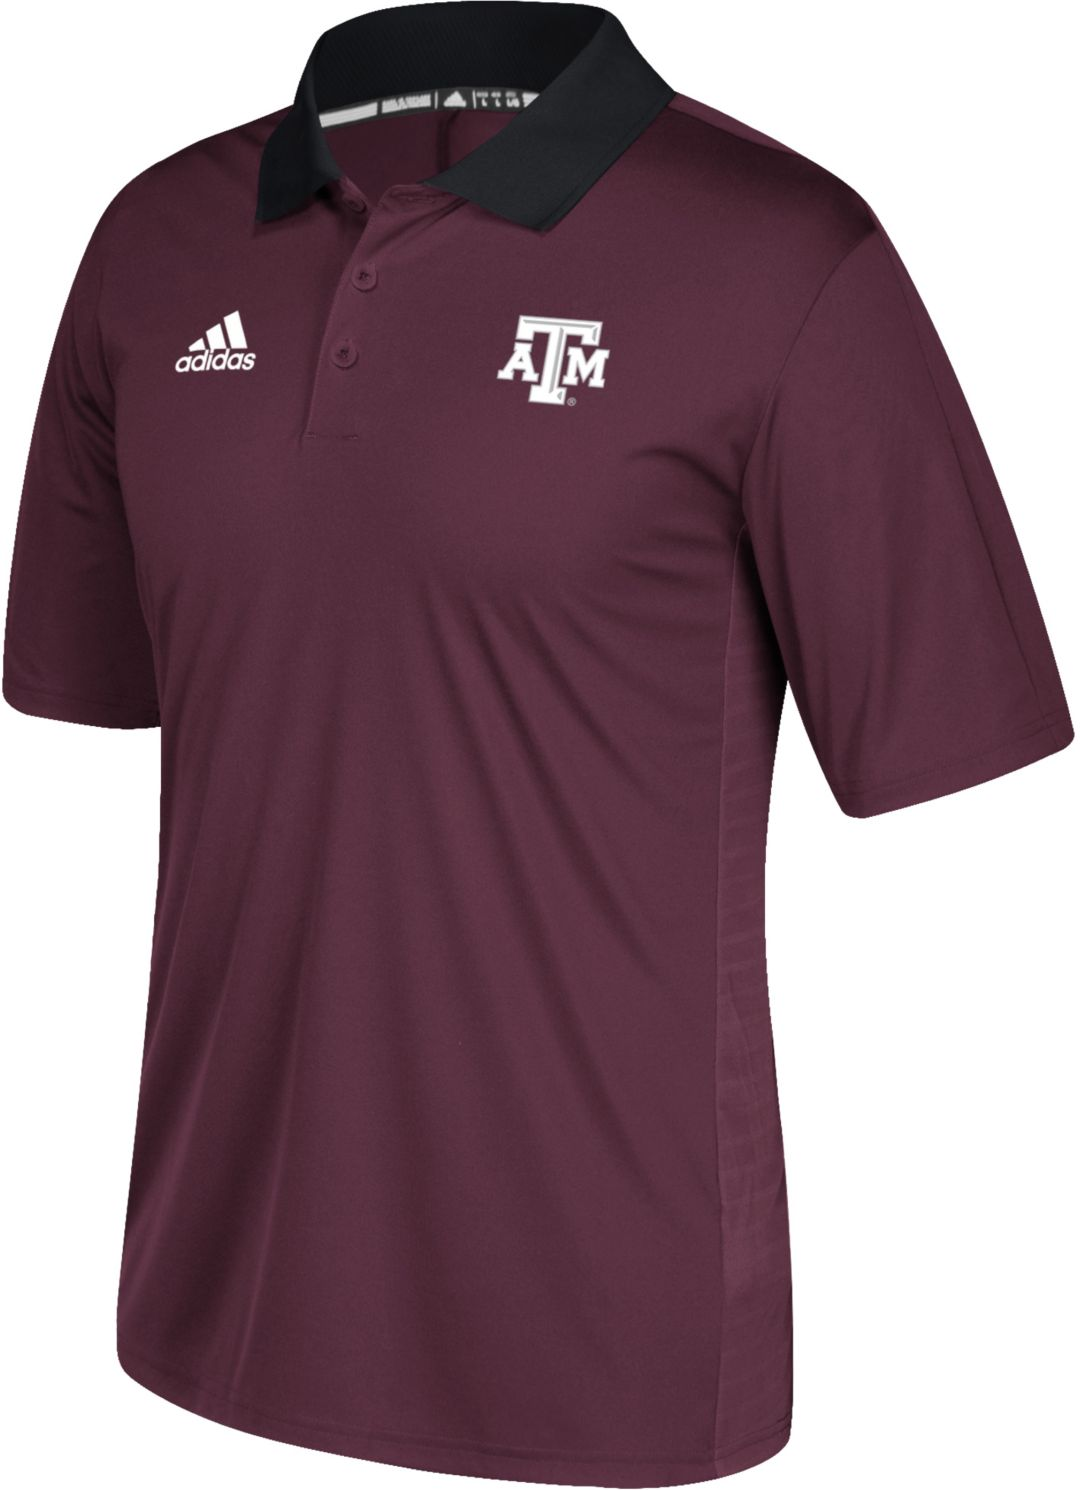 amp;m Texas Maroon Adidas Aggies Polo Coaches A Men's Sideline 3luTKJF1c